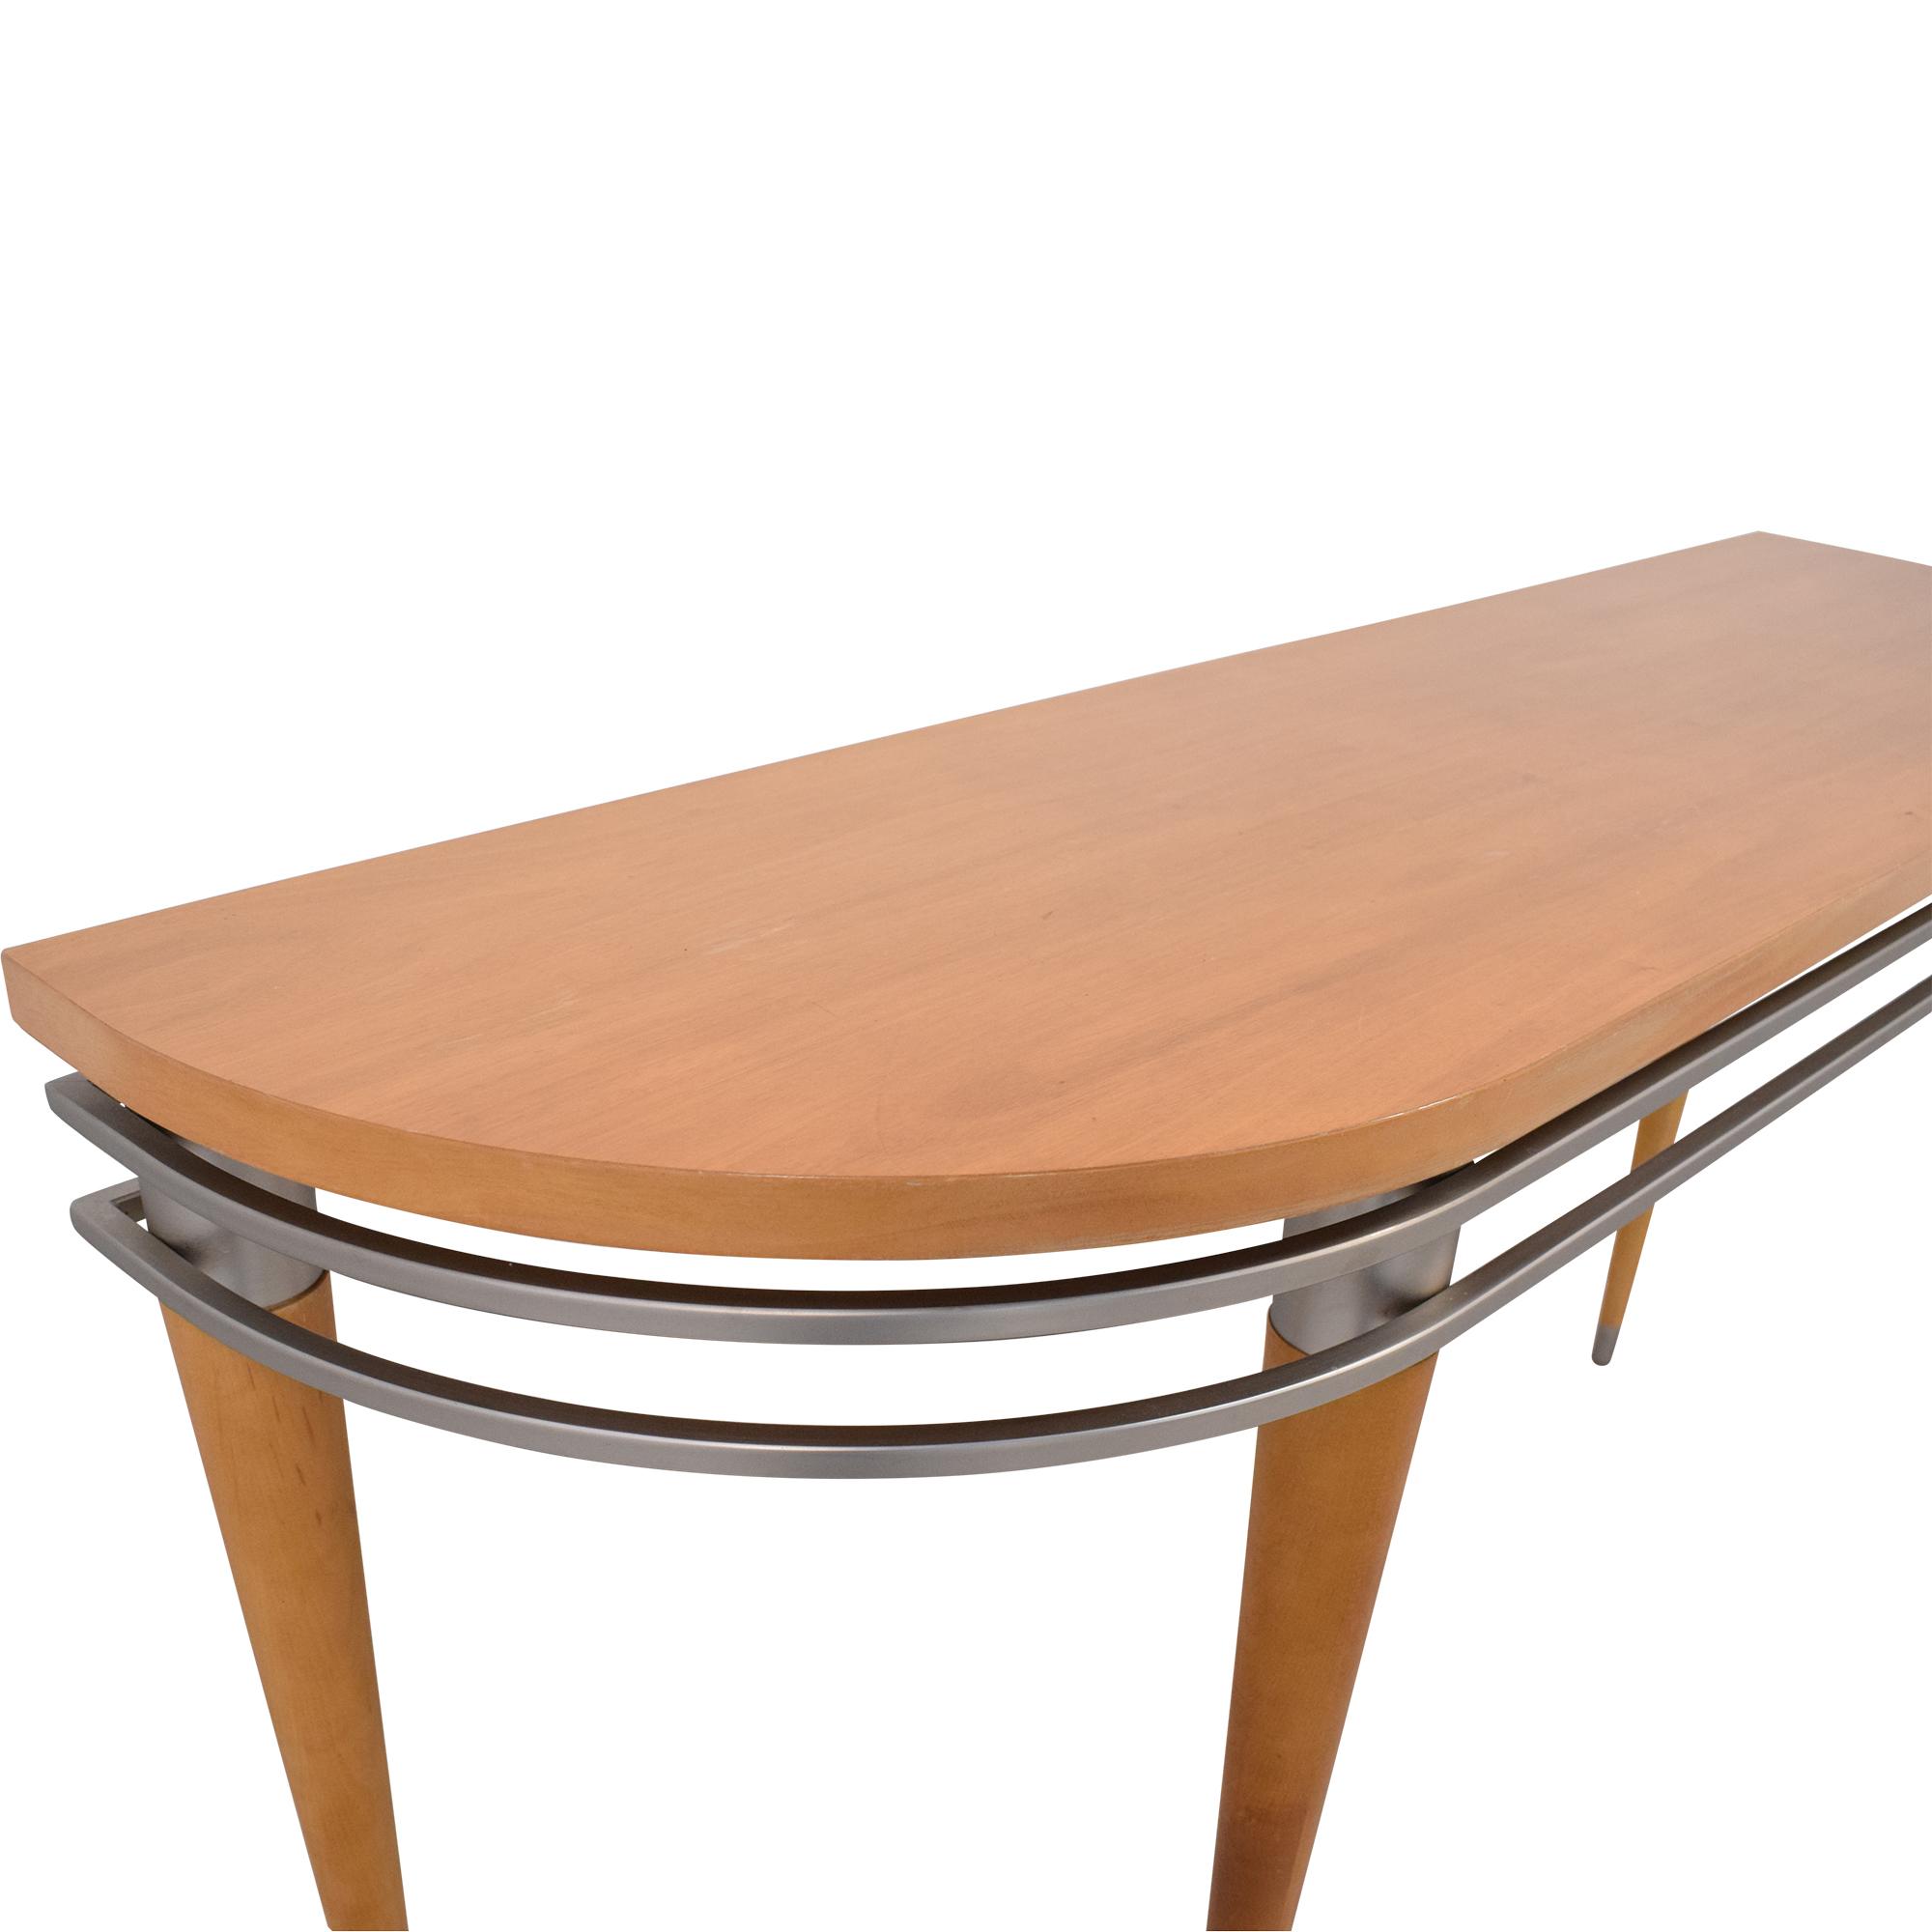 Ethan Allen Ethan Allen Radius Sofa Console Table used